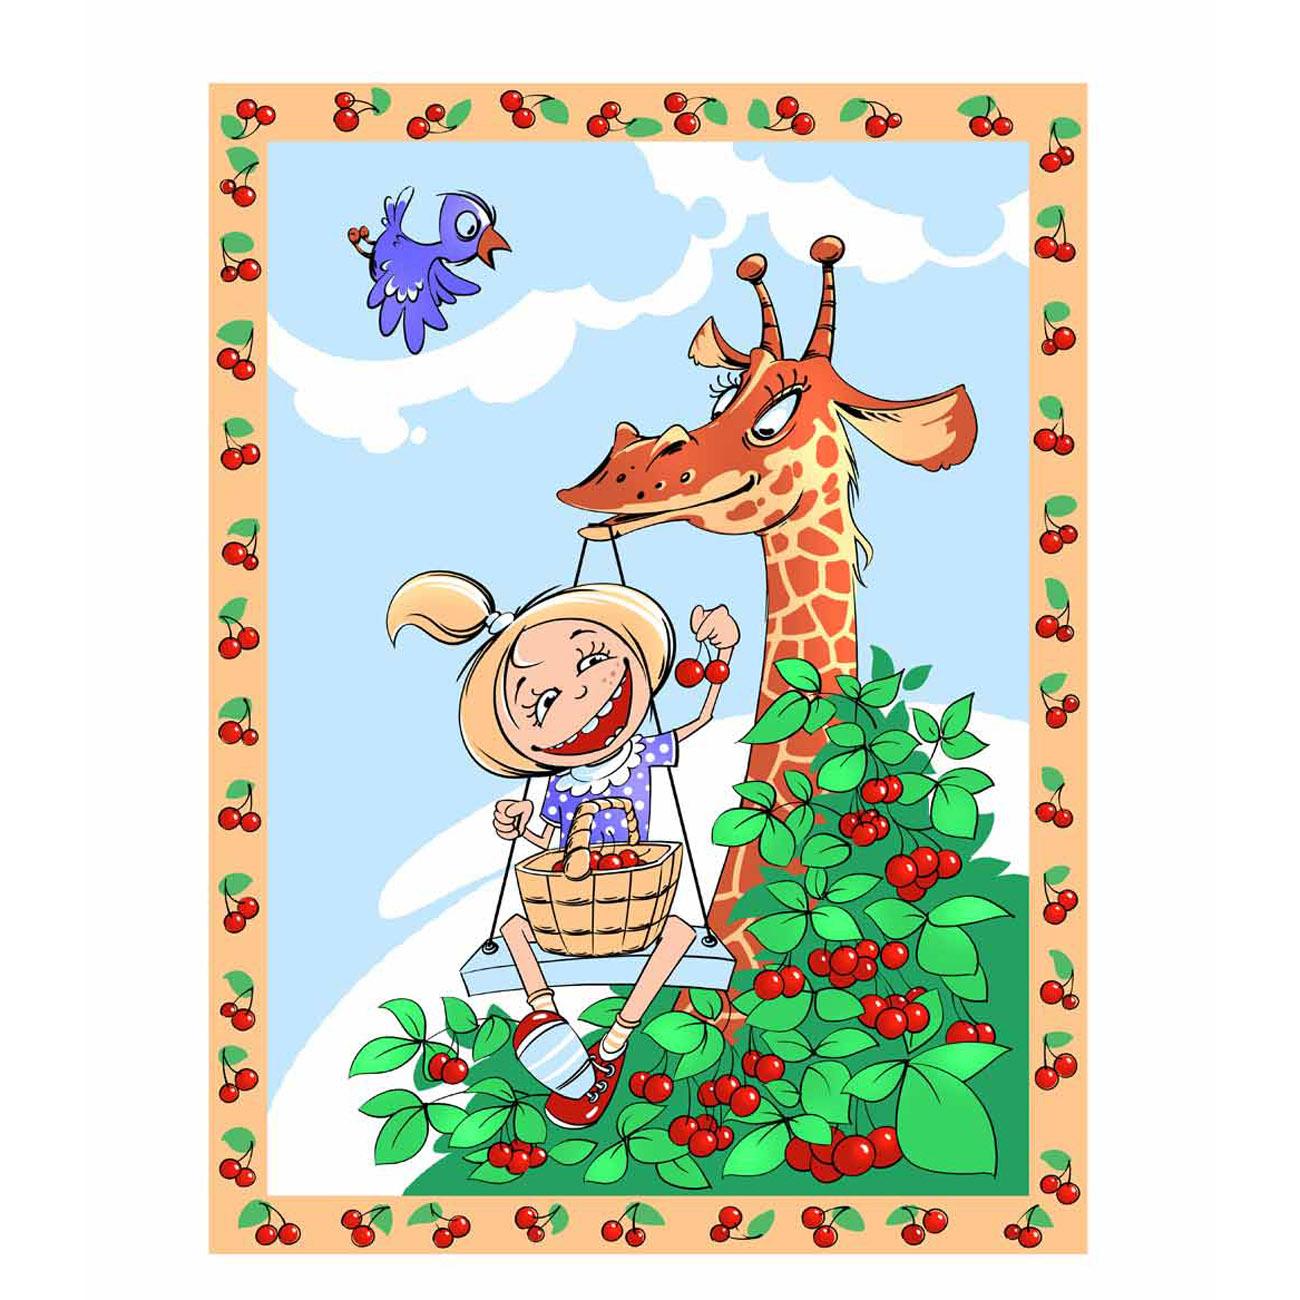 Плед-покрывало ОТК Velsoft 100х140 Жираф и девочка